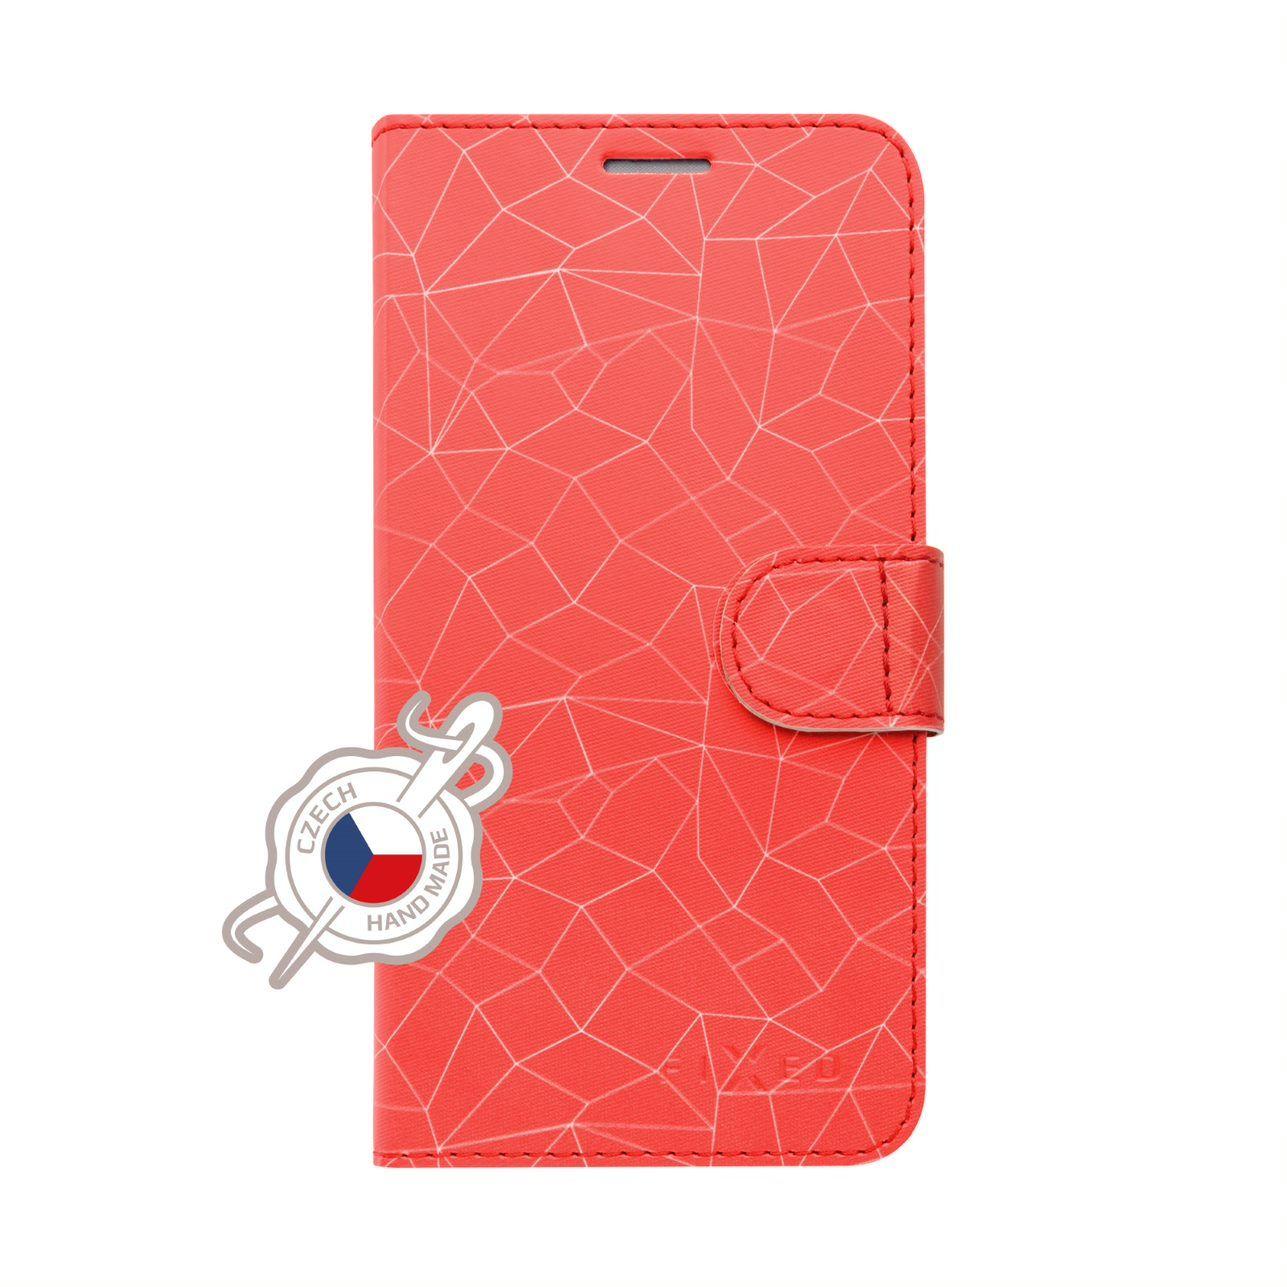 FIXED FIT flipové pouzdro pro Xiaomi Redmi Note 7/7 Pro, motiv Red Mesh